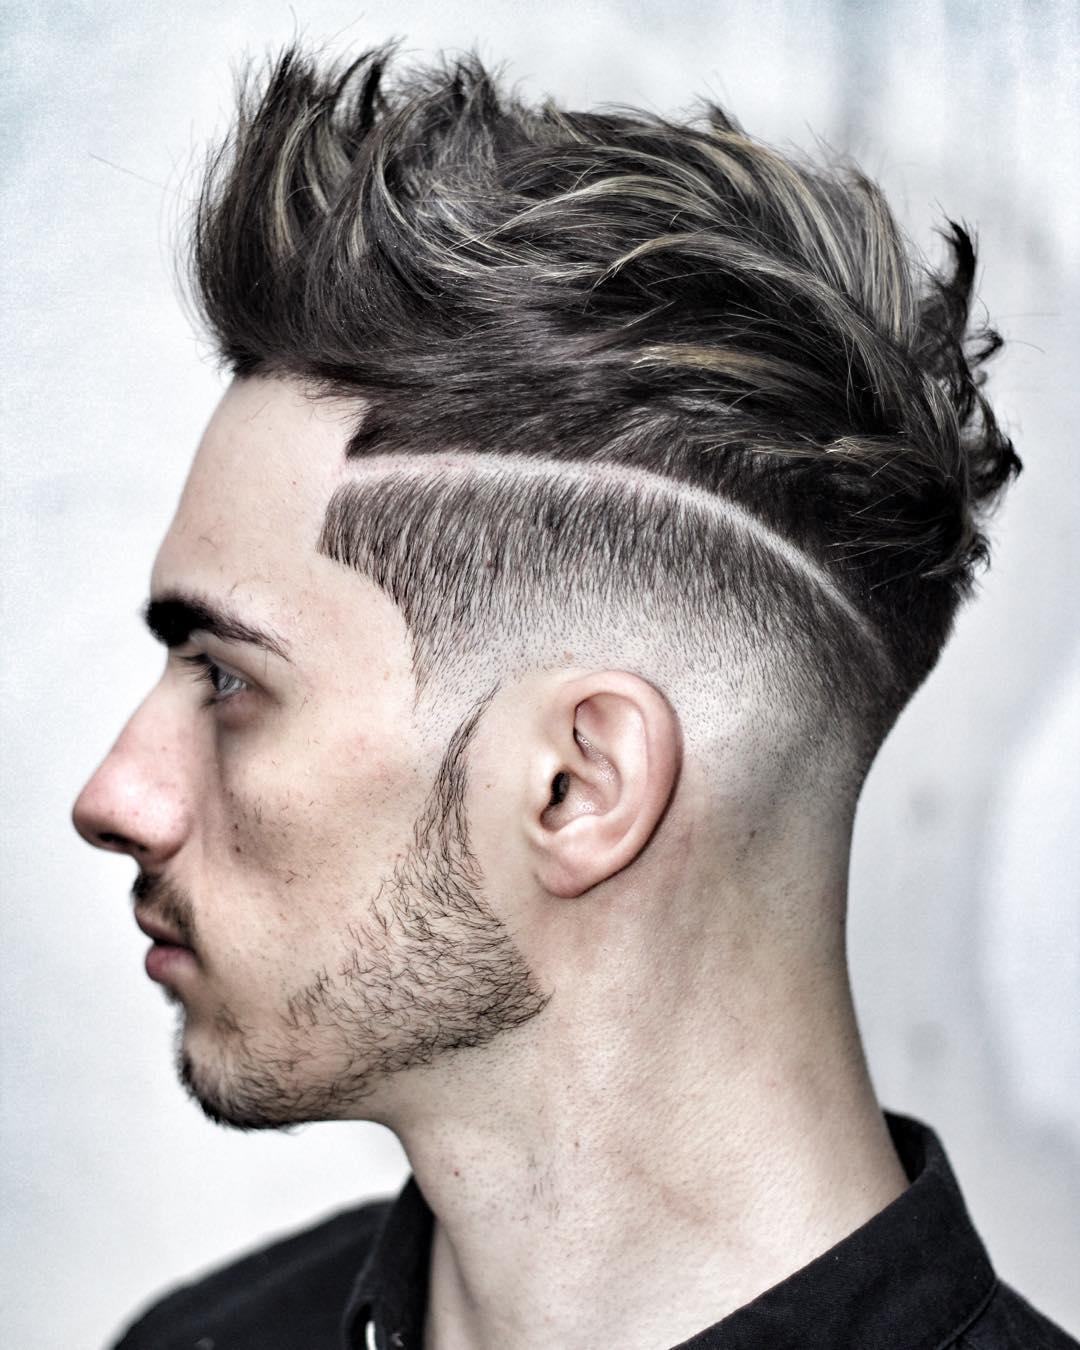 Astounding Short Hair Hairstyles And Haircuts For Men 2017 Short Hairstyles Gunalazisus